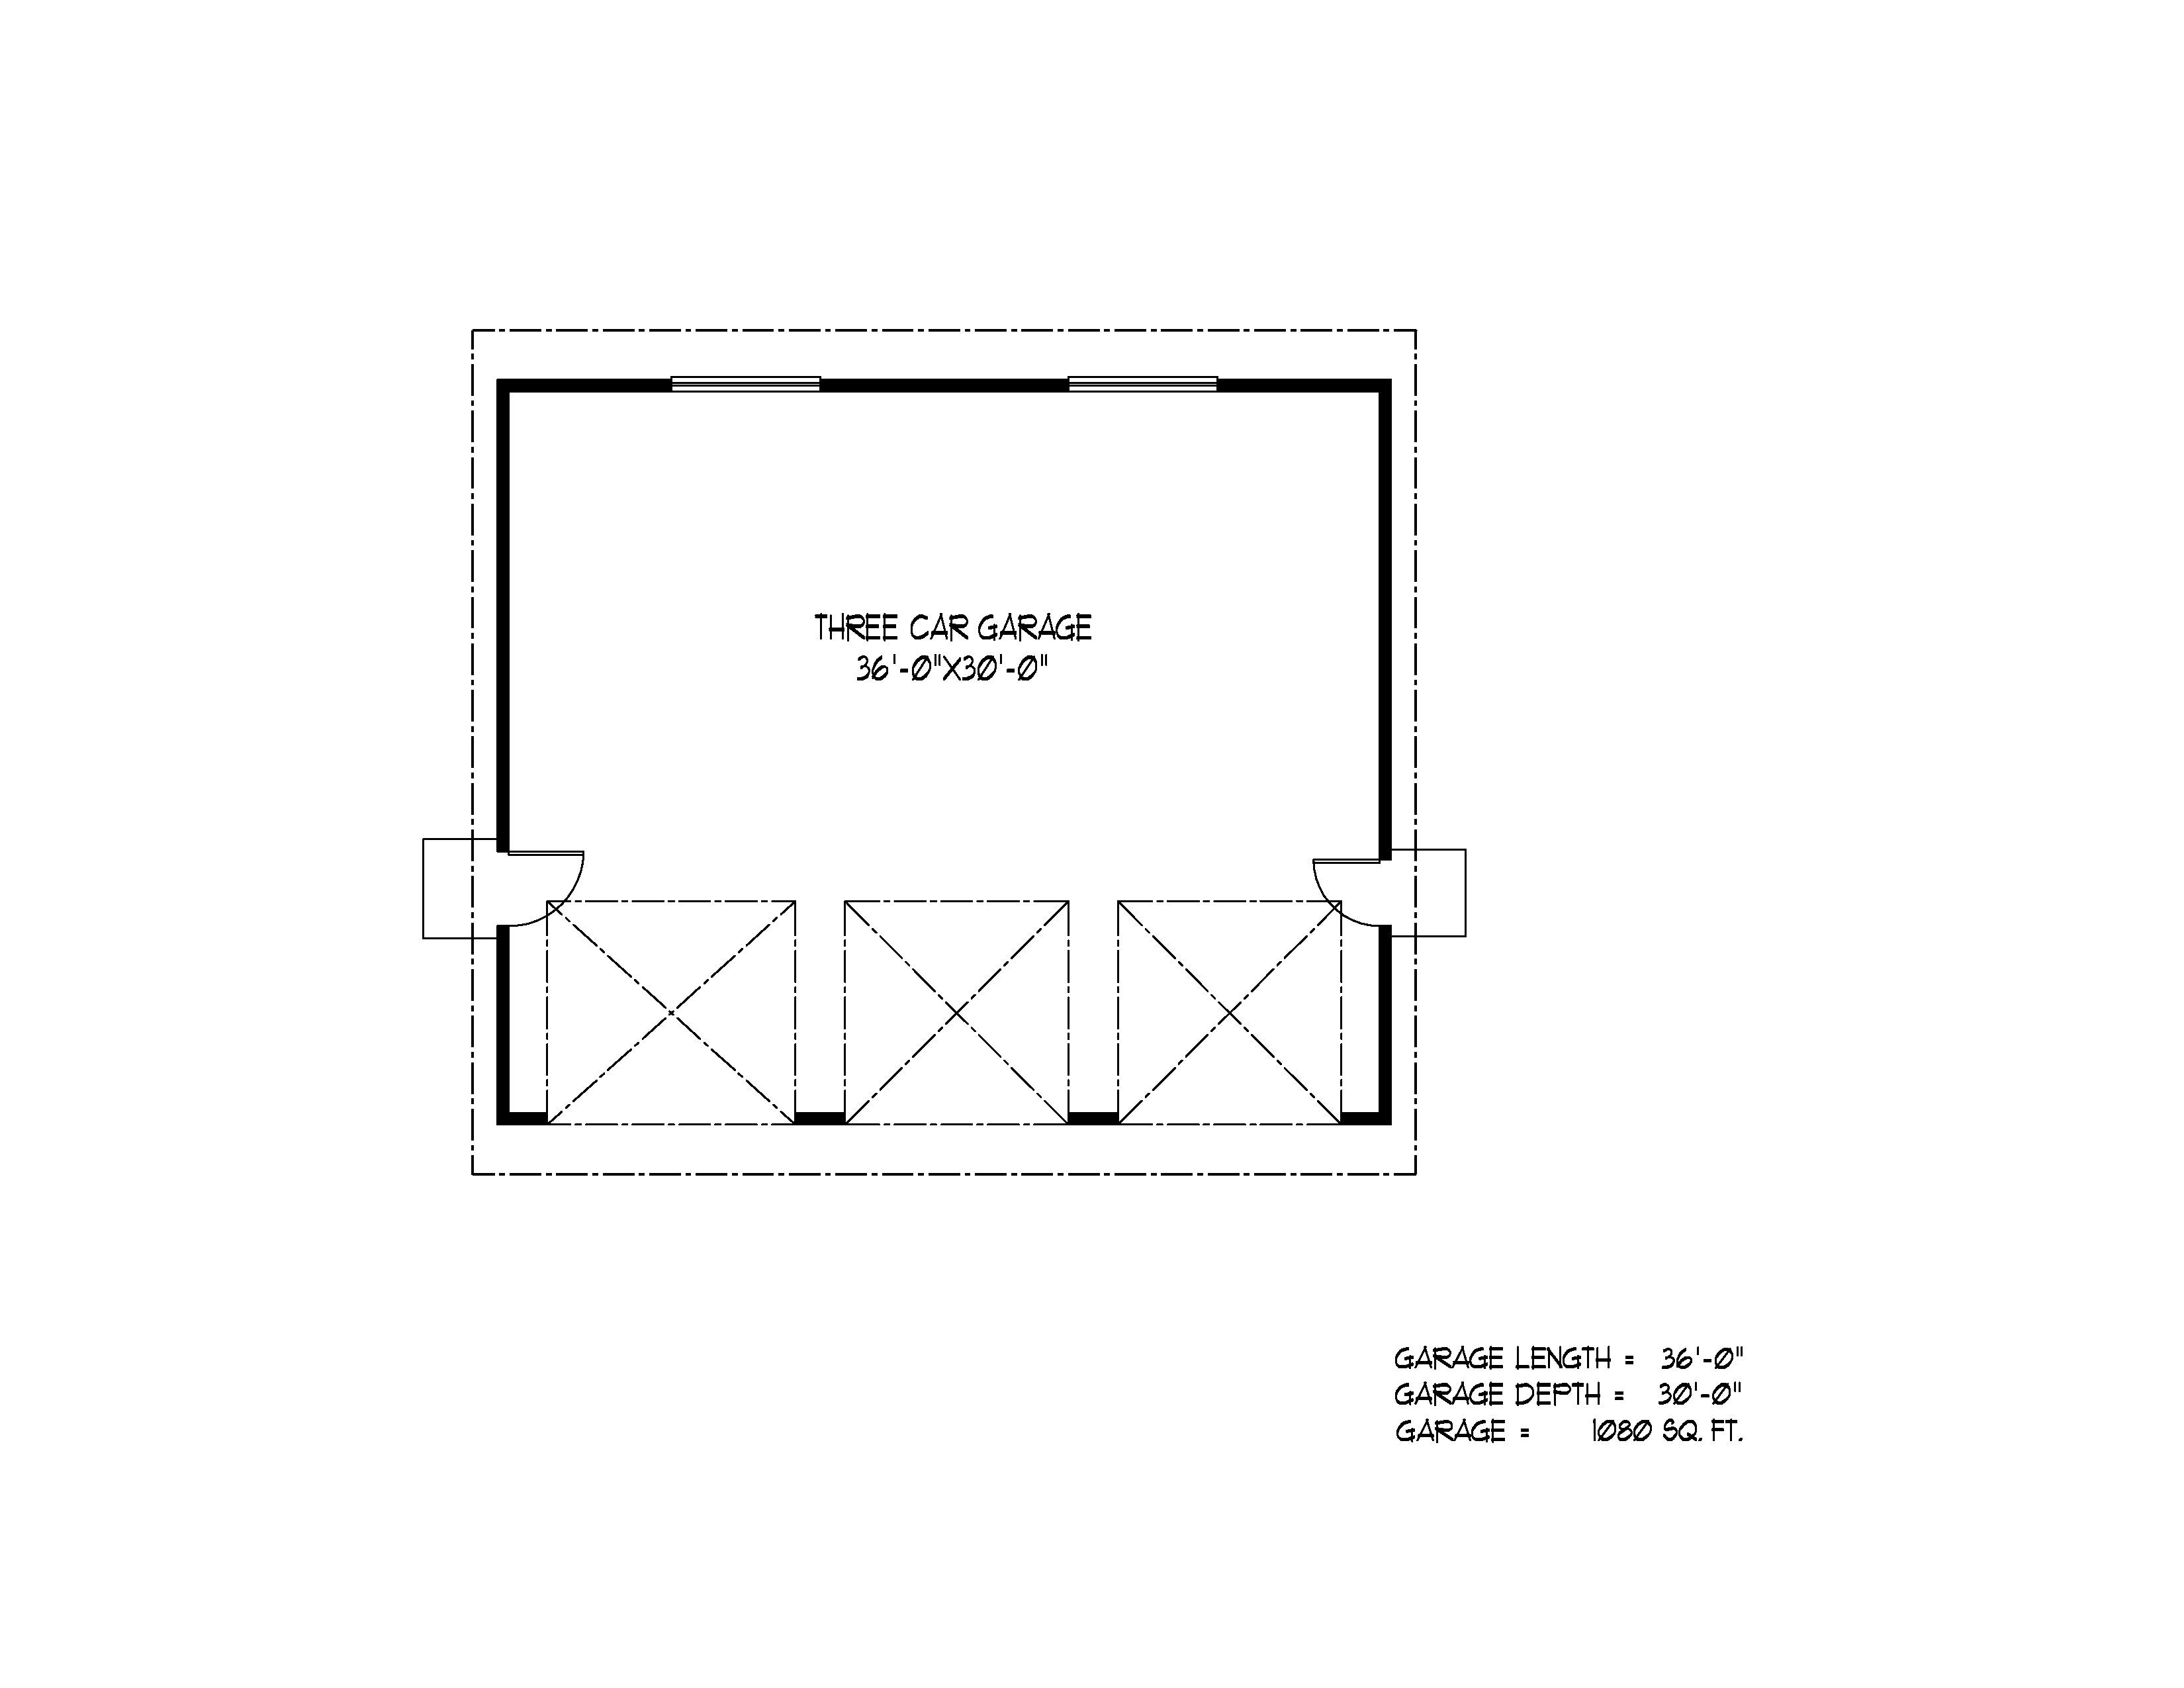 detached garages floorplan